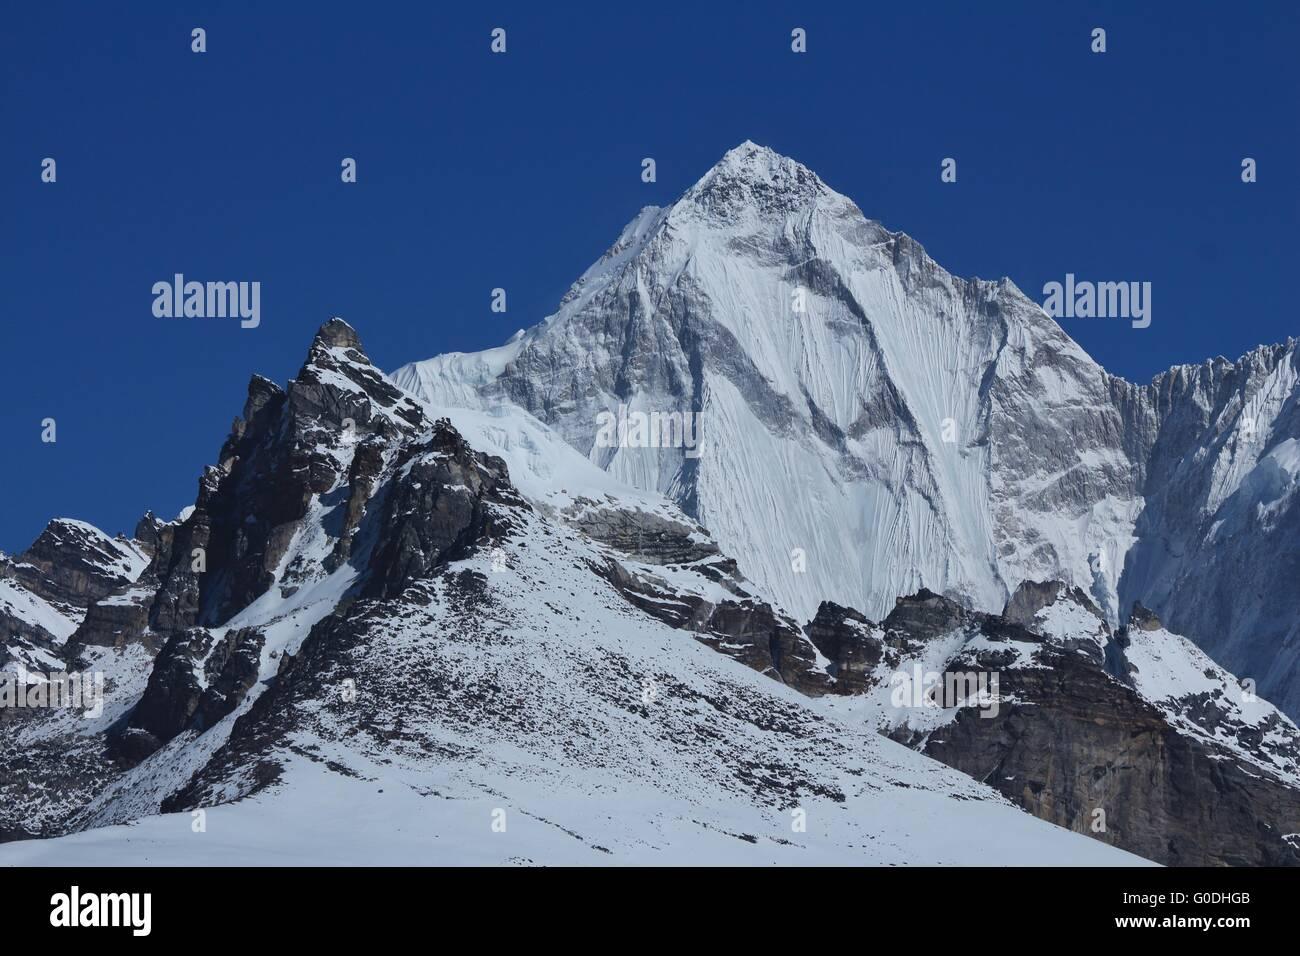 High mountain next to Cho Oyu - Stock Image